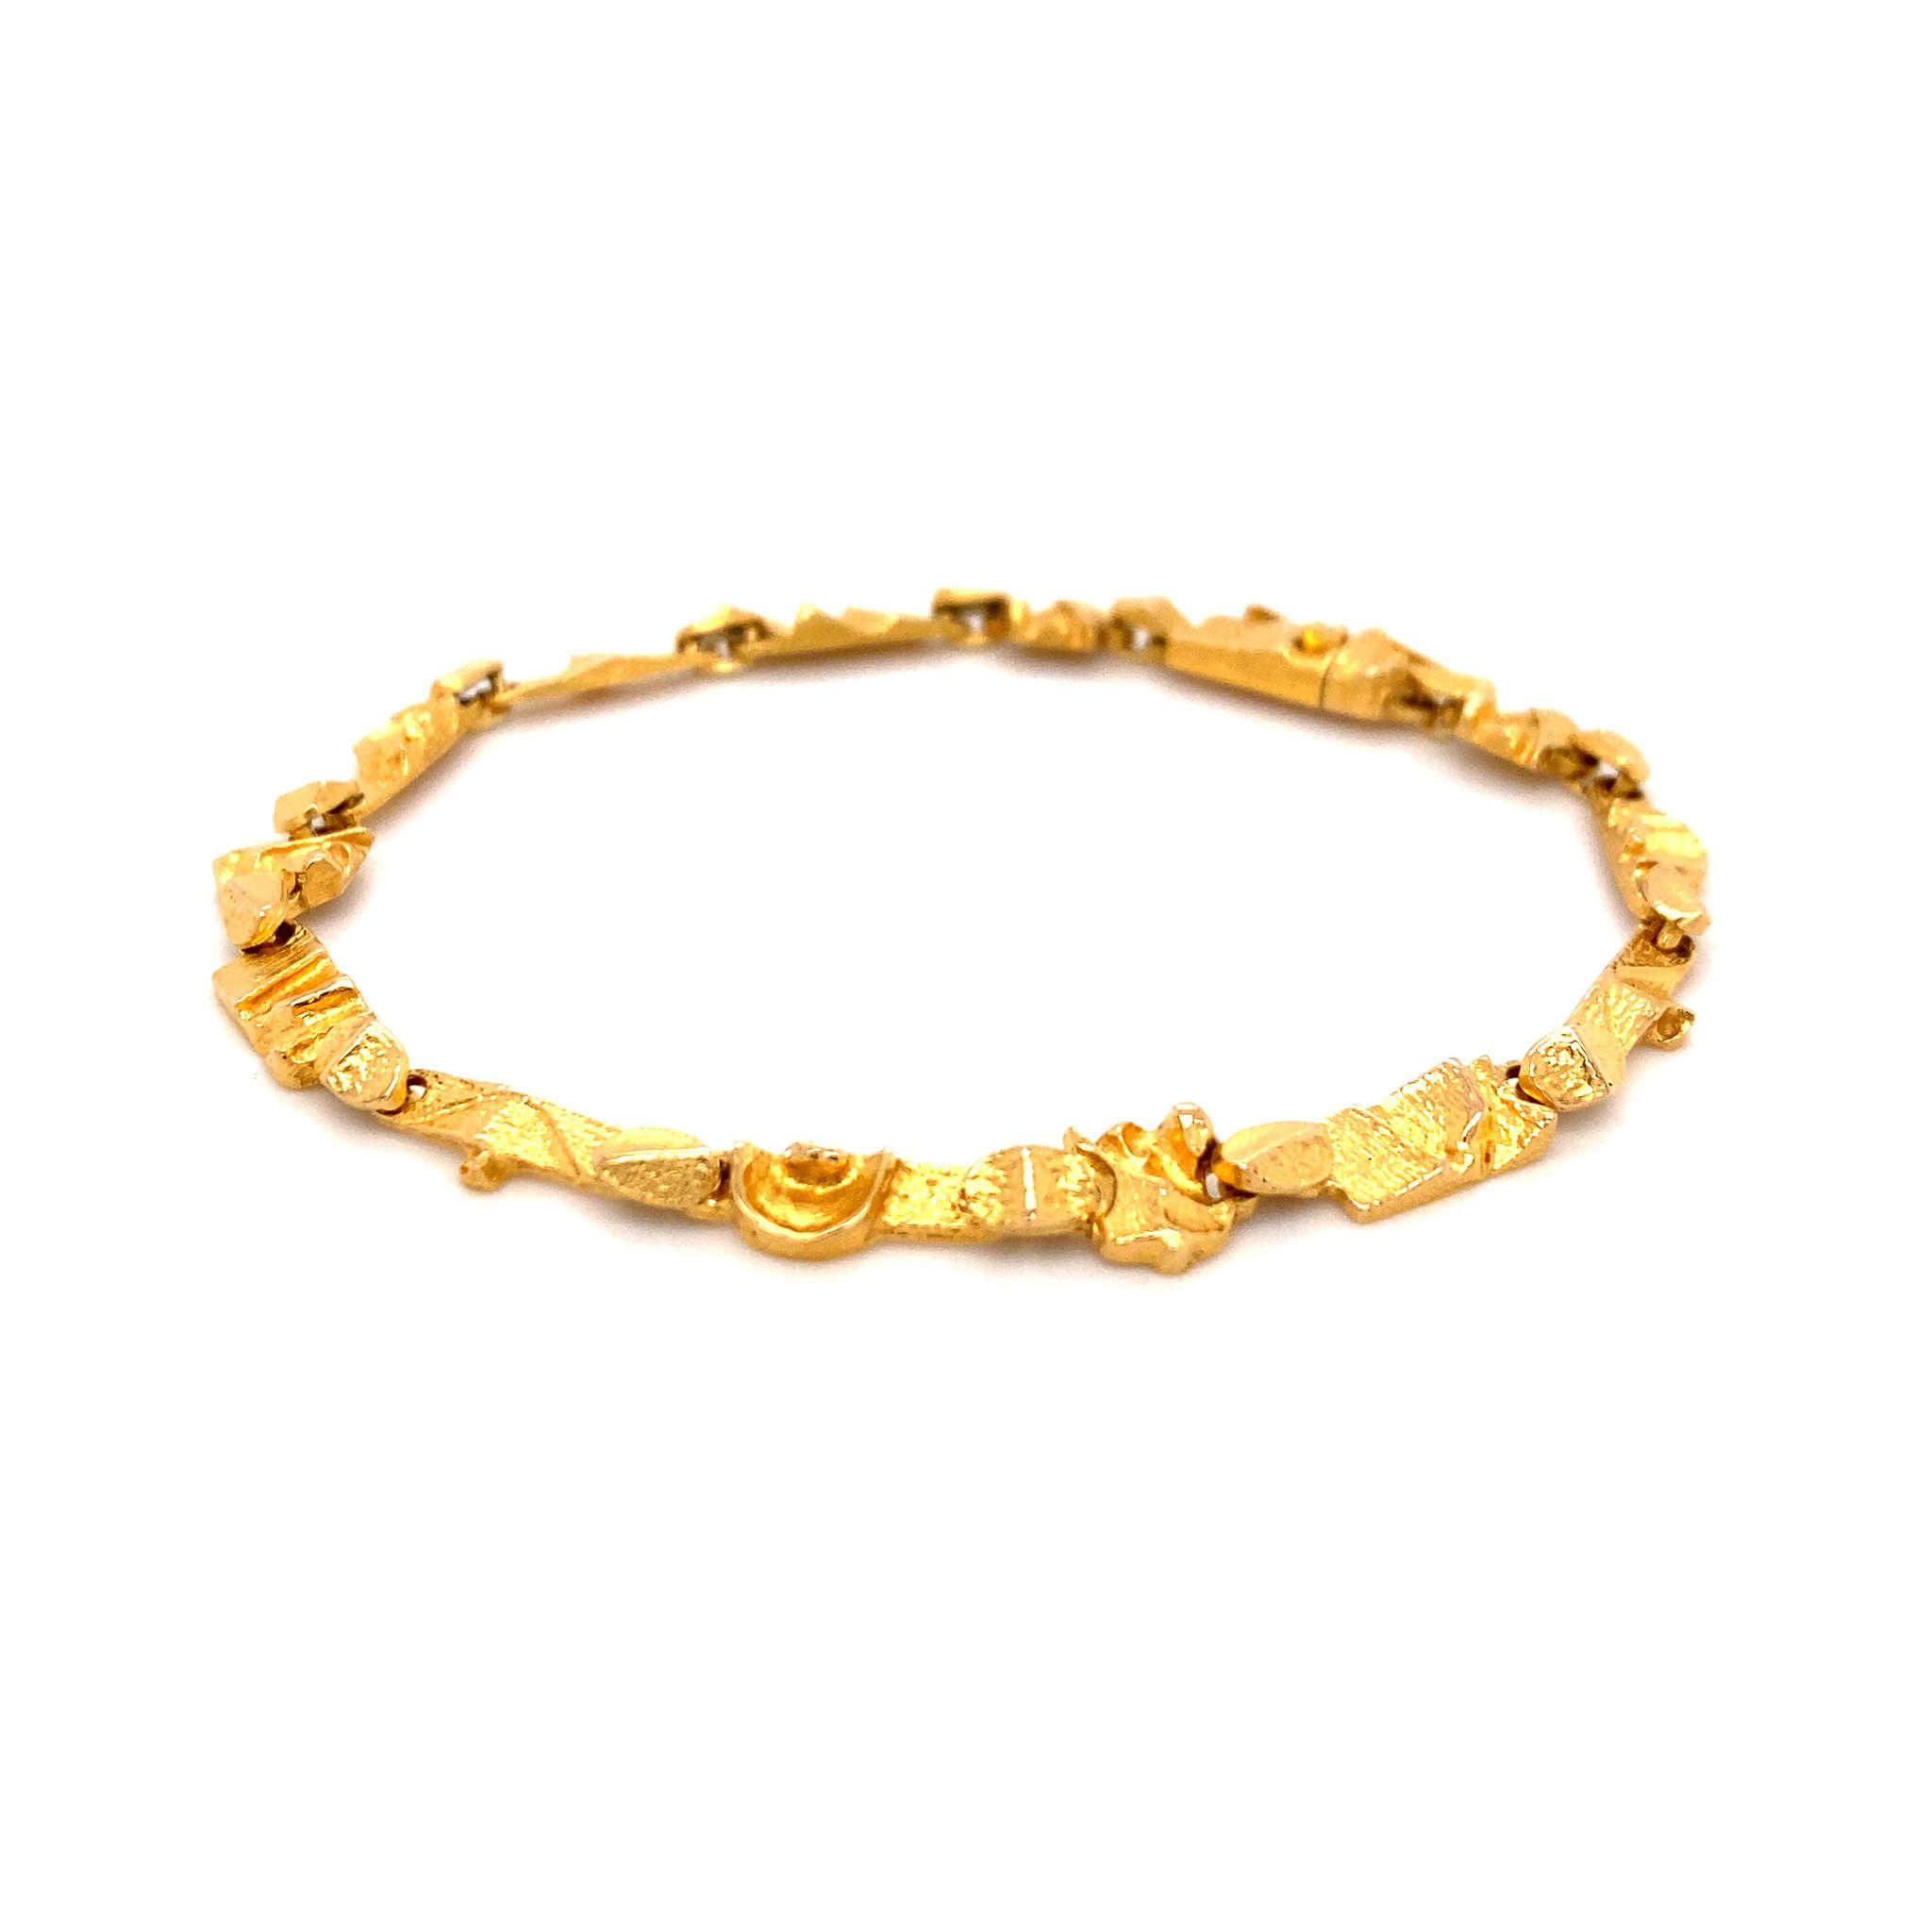 Lapponia Lapponia Tenochtitlan 14 krt. geelgouden armband 18,5 cm.